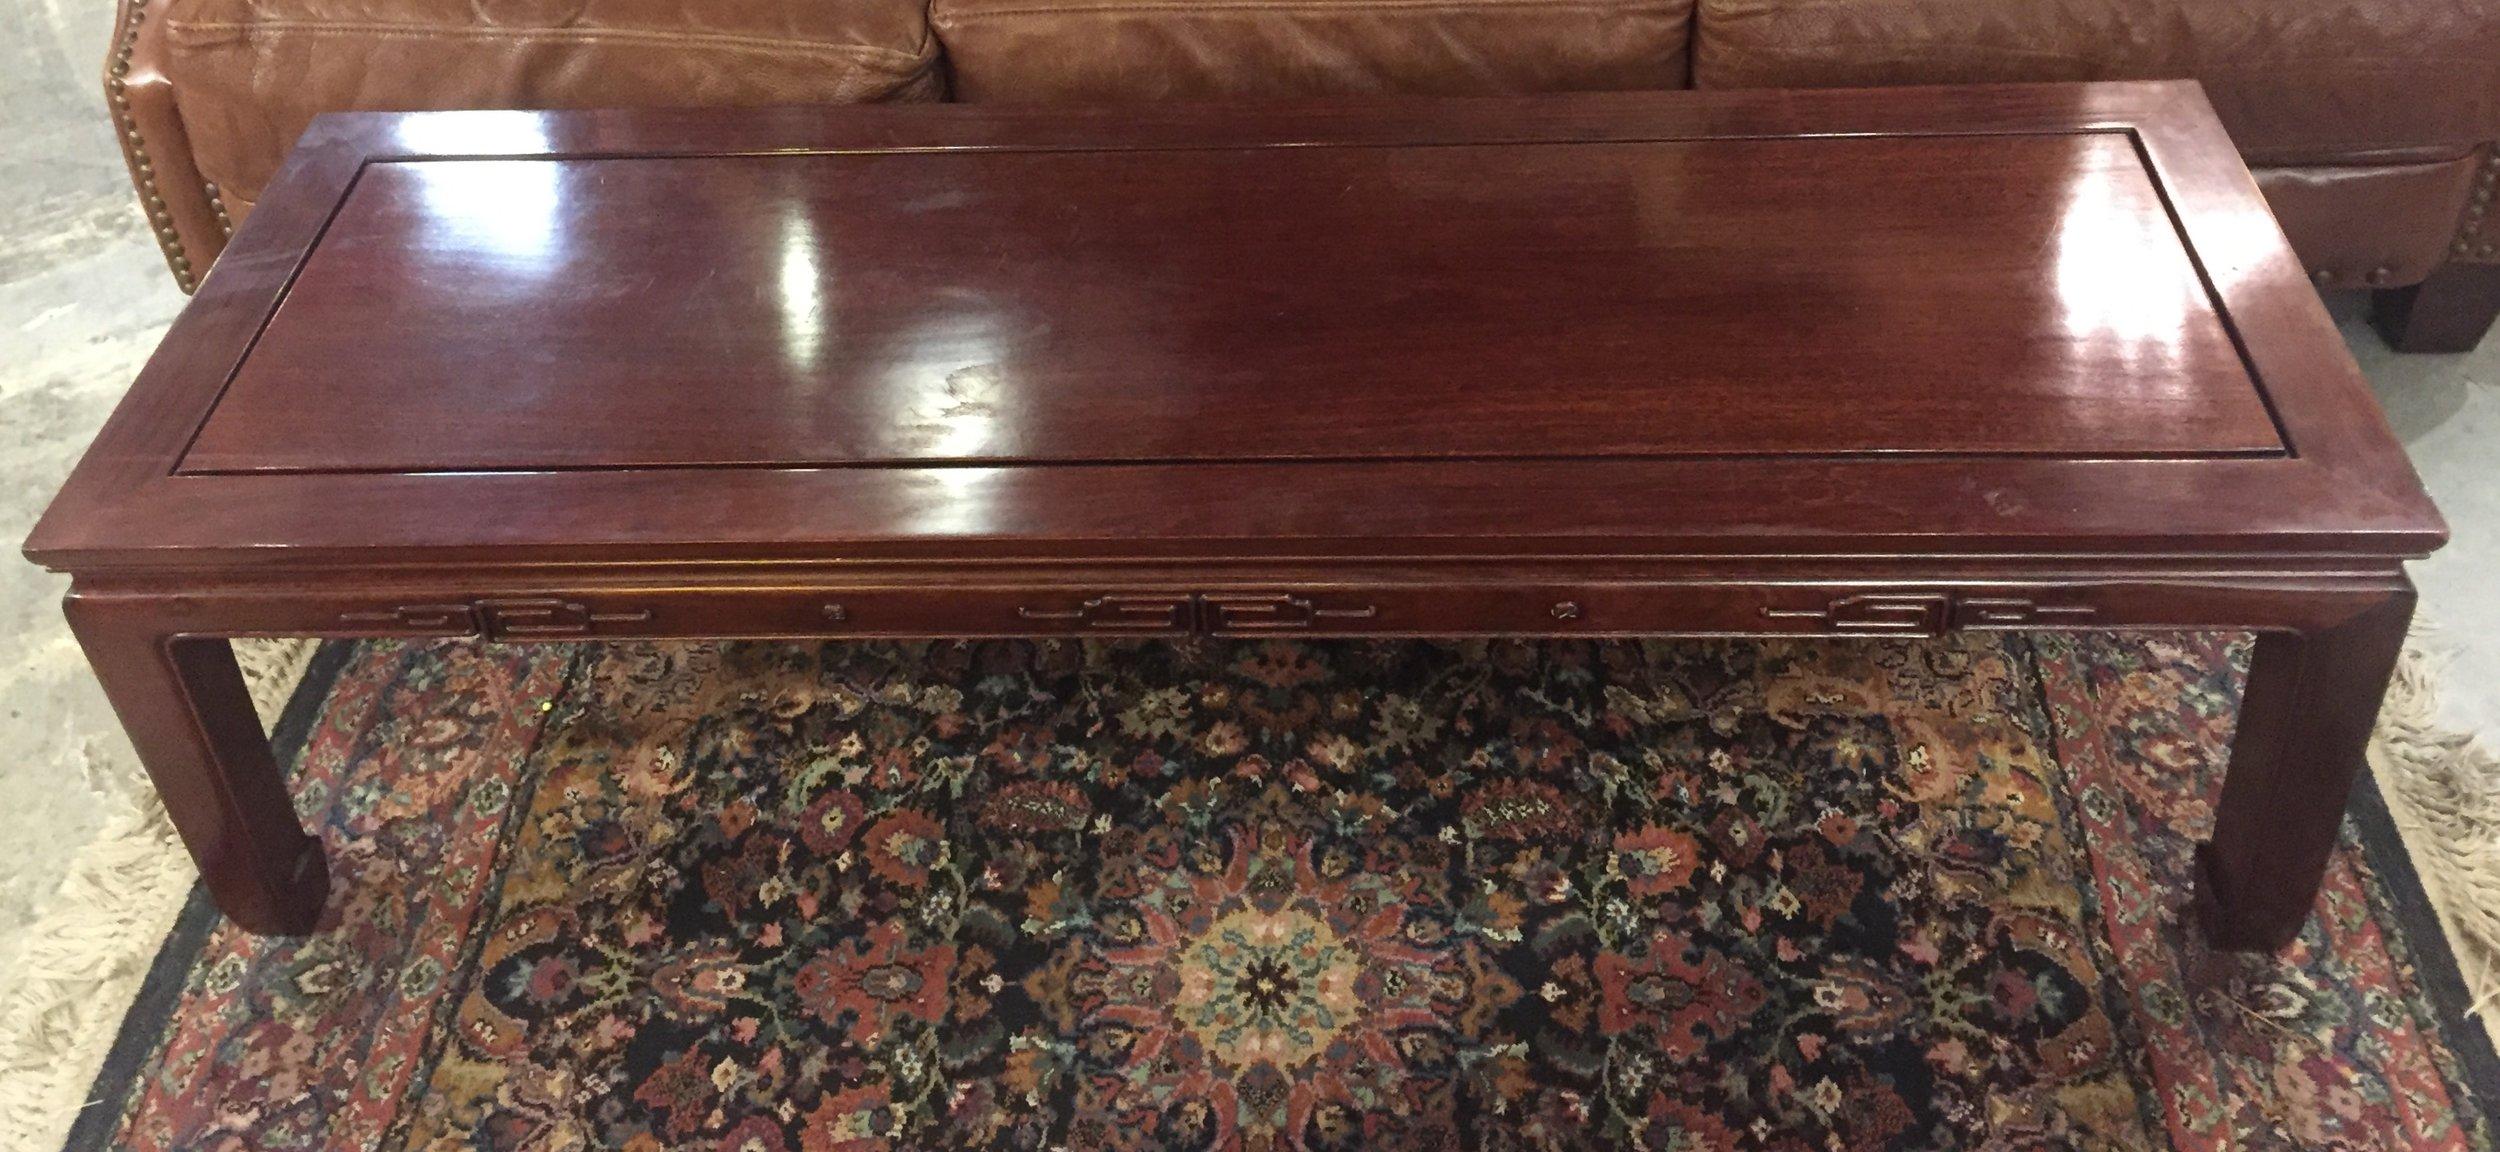 Oriental Coffee Table $89.95 - C1085 24265